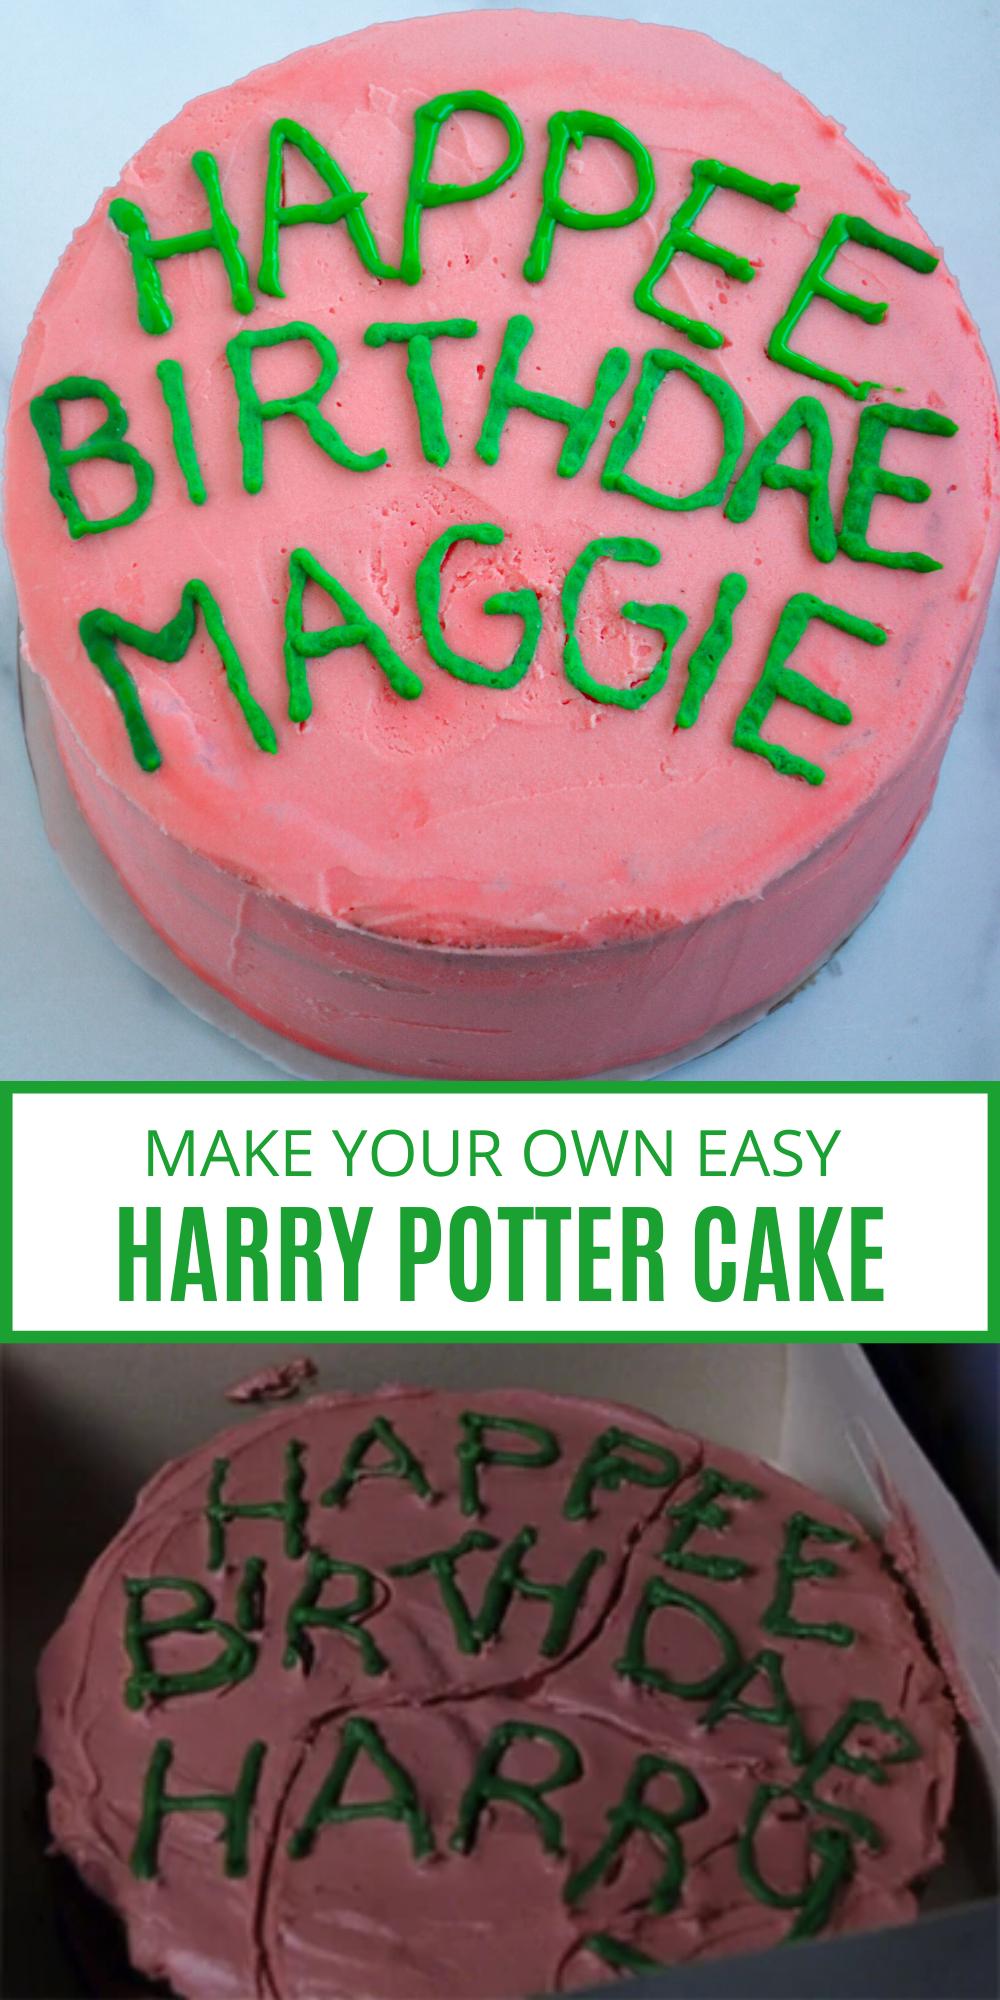 Harry Potter Birthday Cake Recipe Harry Potter Birthday Cake Harry Potter Cake Book Cakes